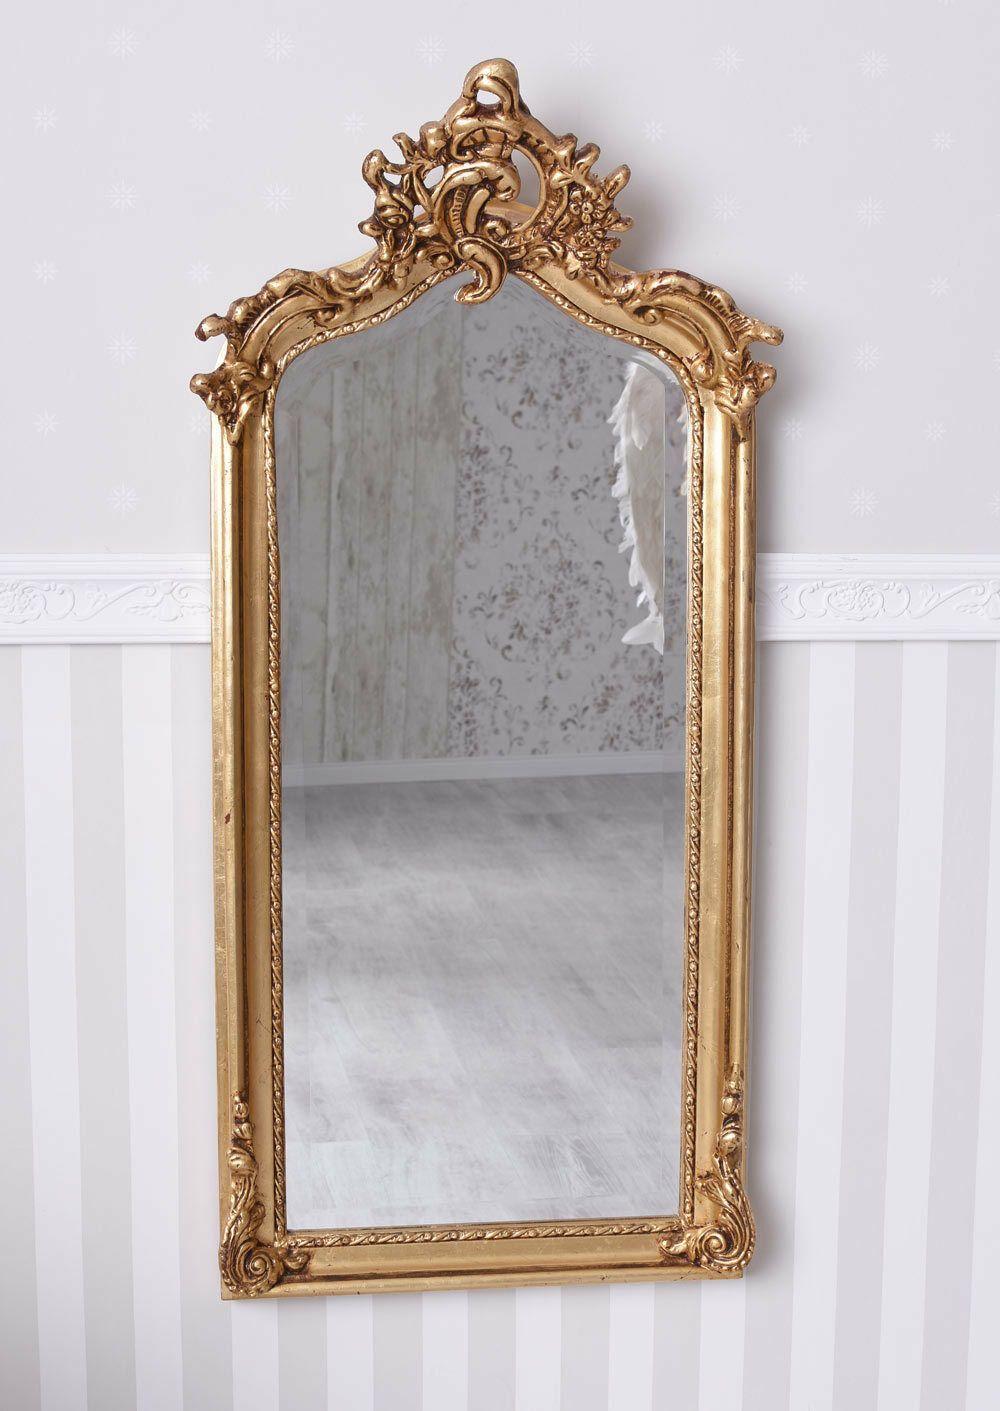 Wandspiegel Gold Spiegel Rokoko Holzspiegel Prunkspiegel Barock Badspiegel Ebay Wandspiegel Spiegel Holz Badspiegel